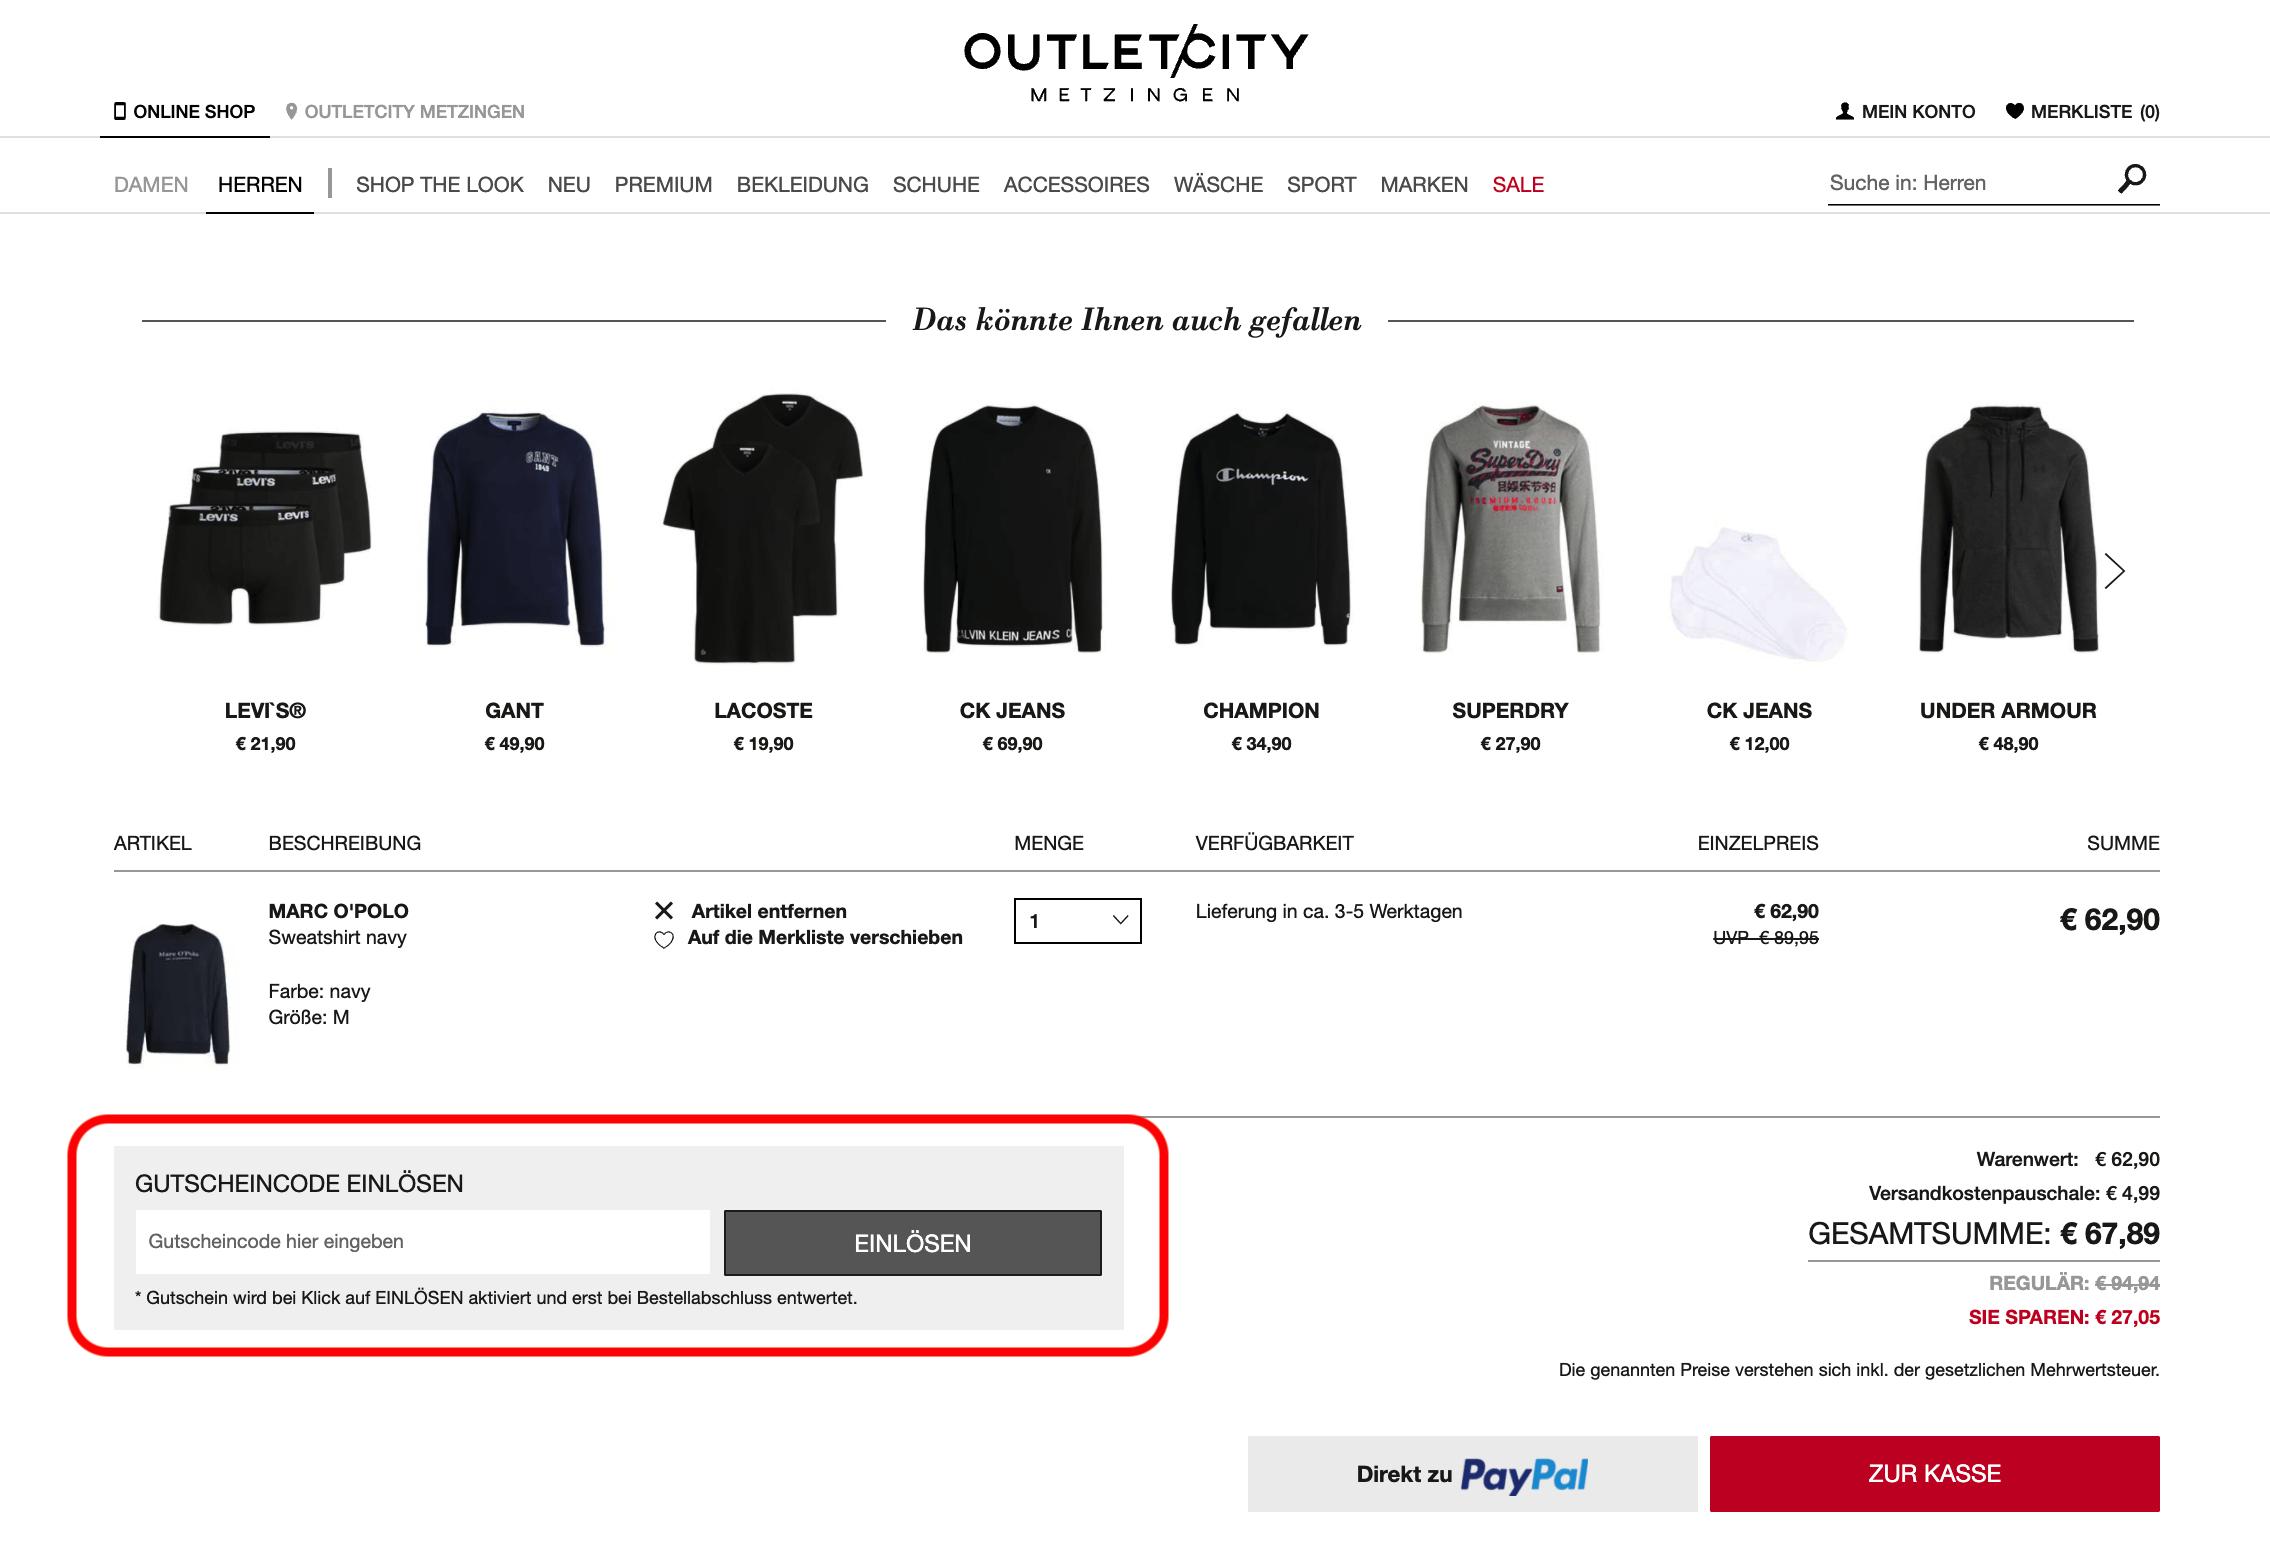 outletcity metzingen-voucher_redemption-how-to